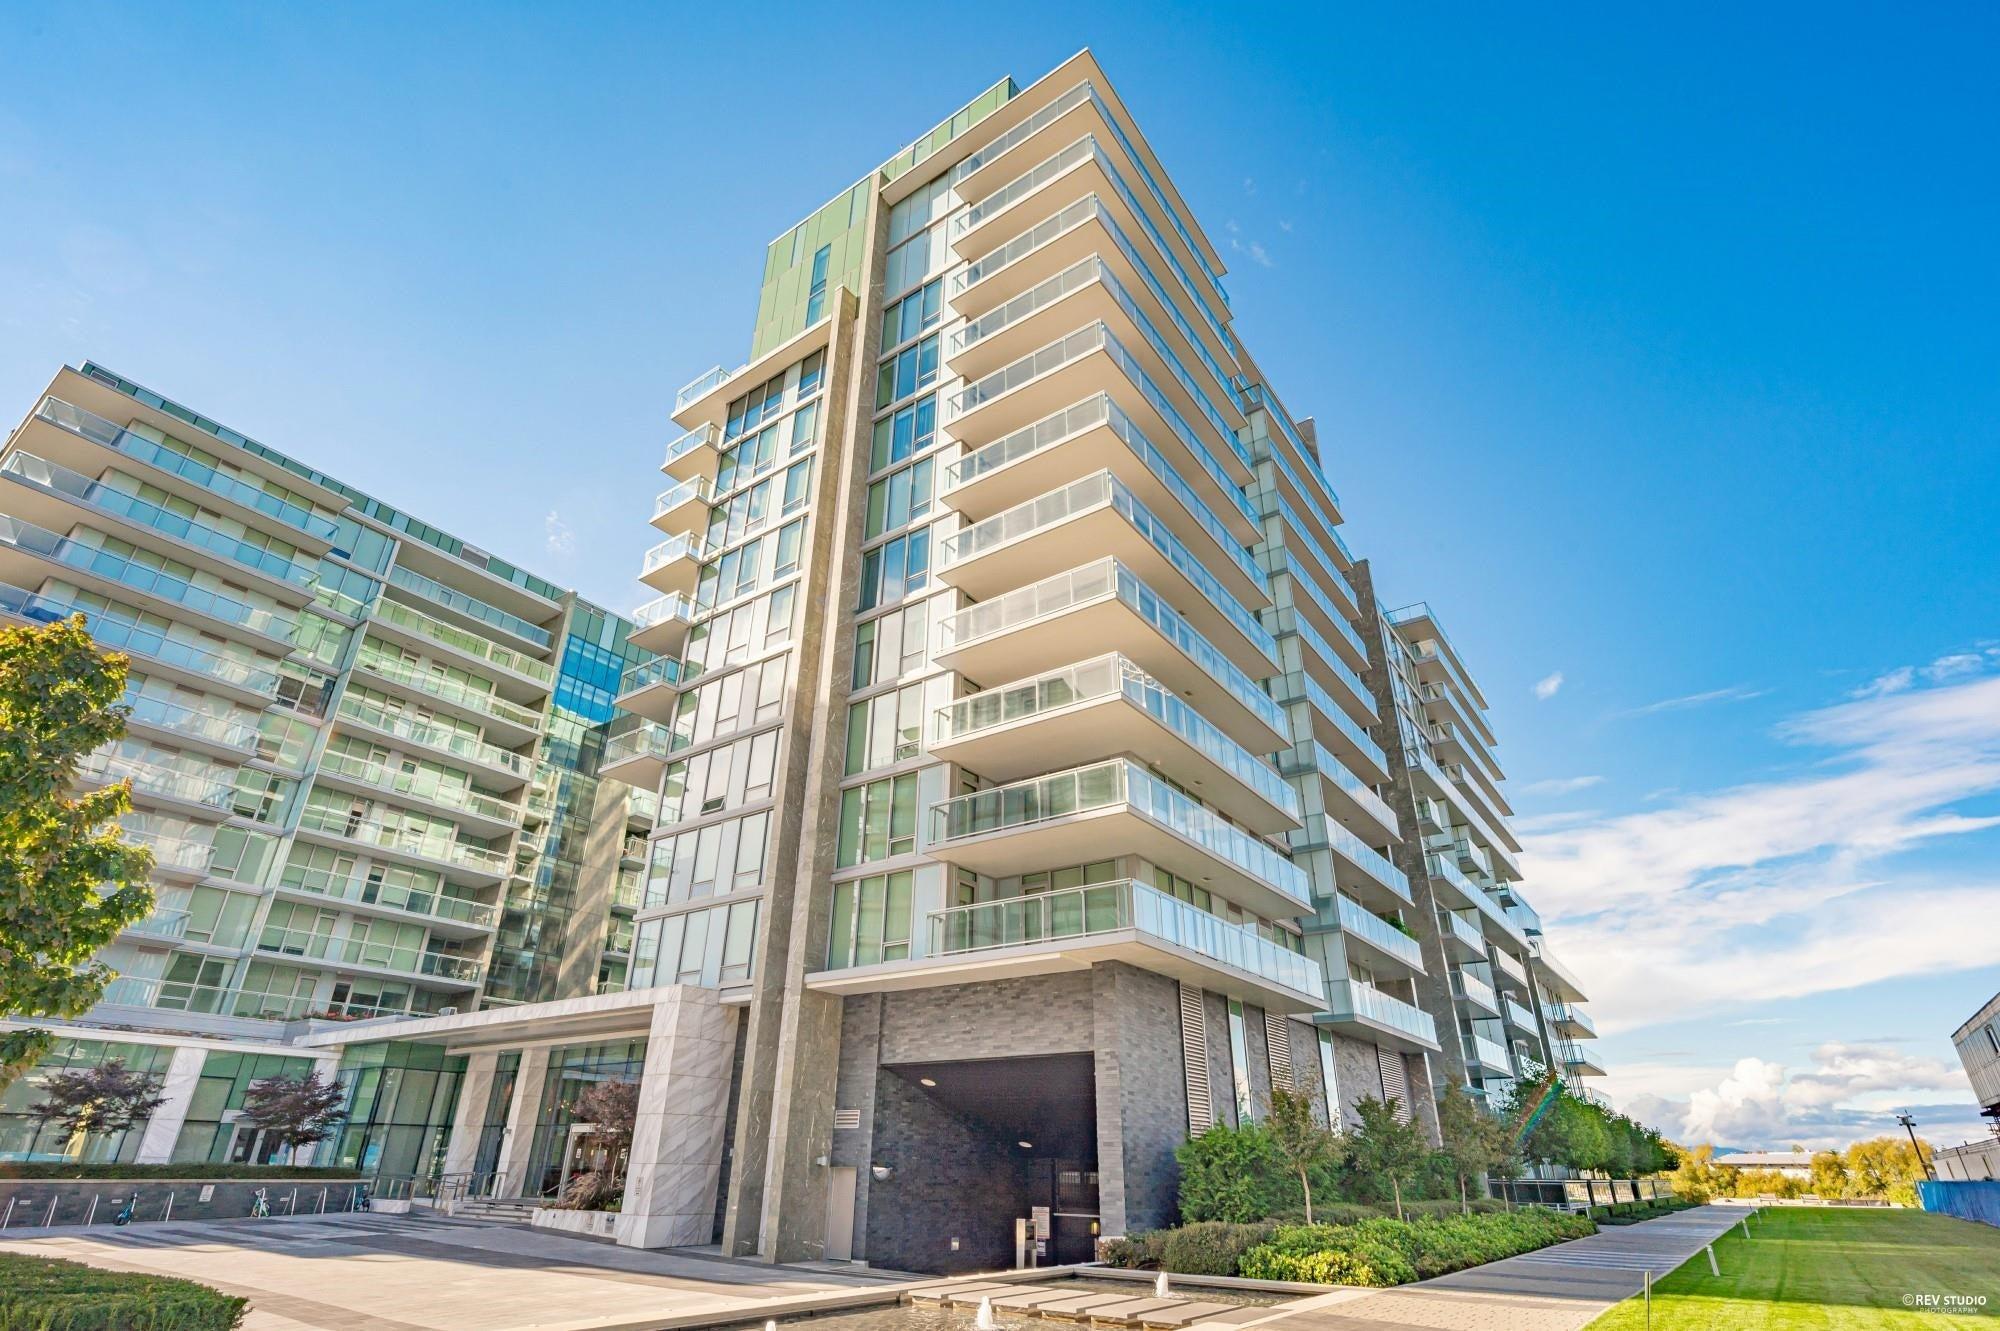 604 6611 PEARSON WAY - Brighouse Apartment/Condo for sale, 1 Bedroom (R2624164)